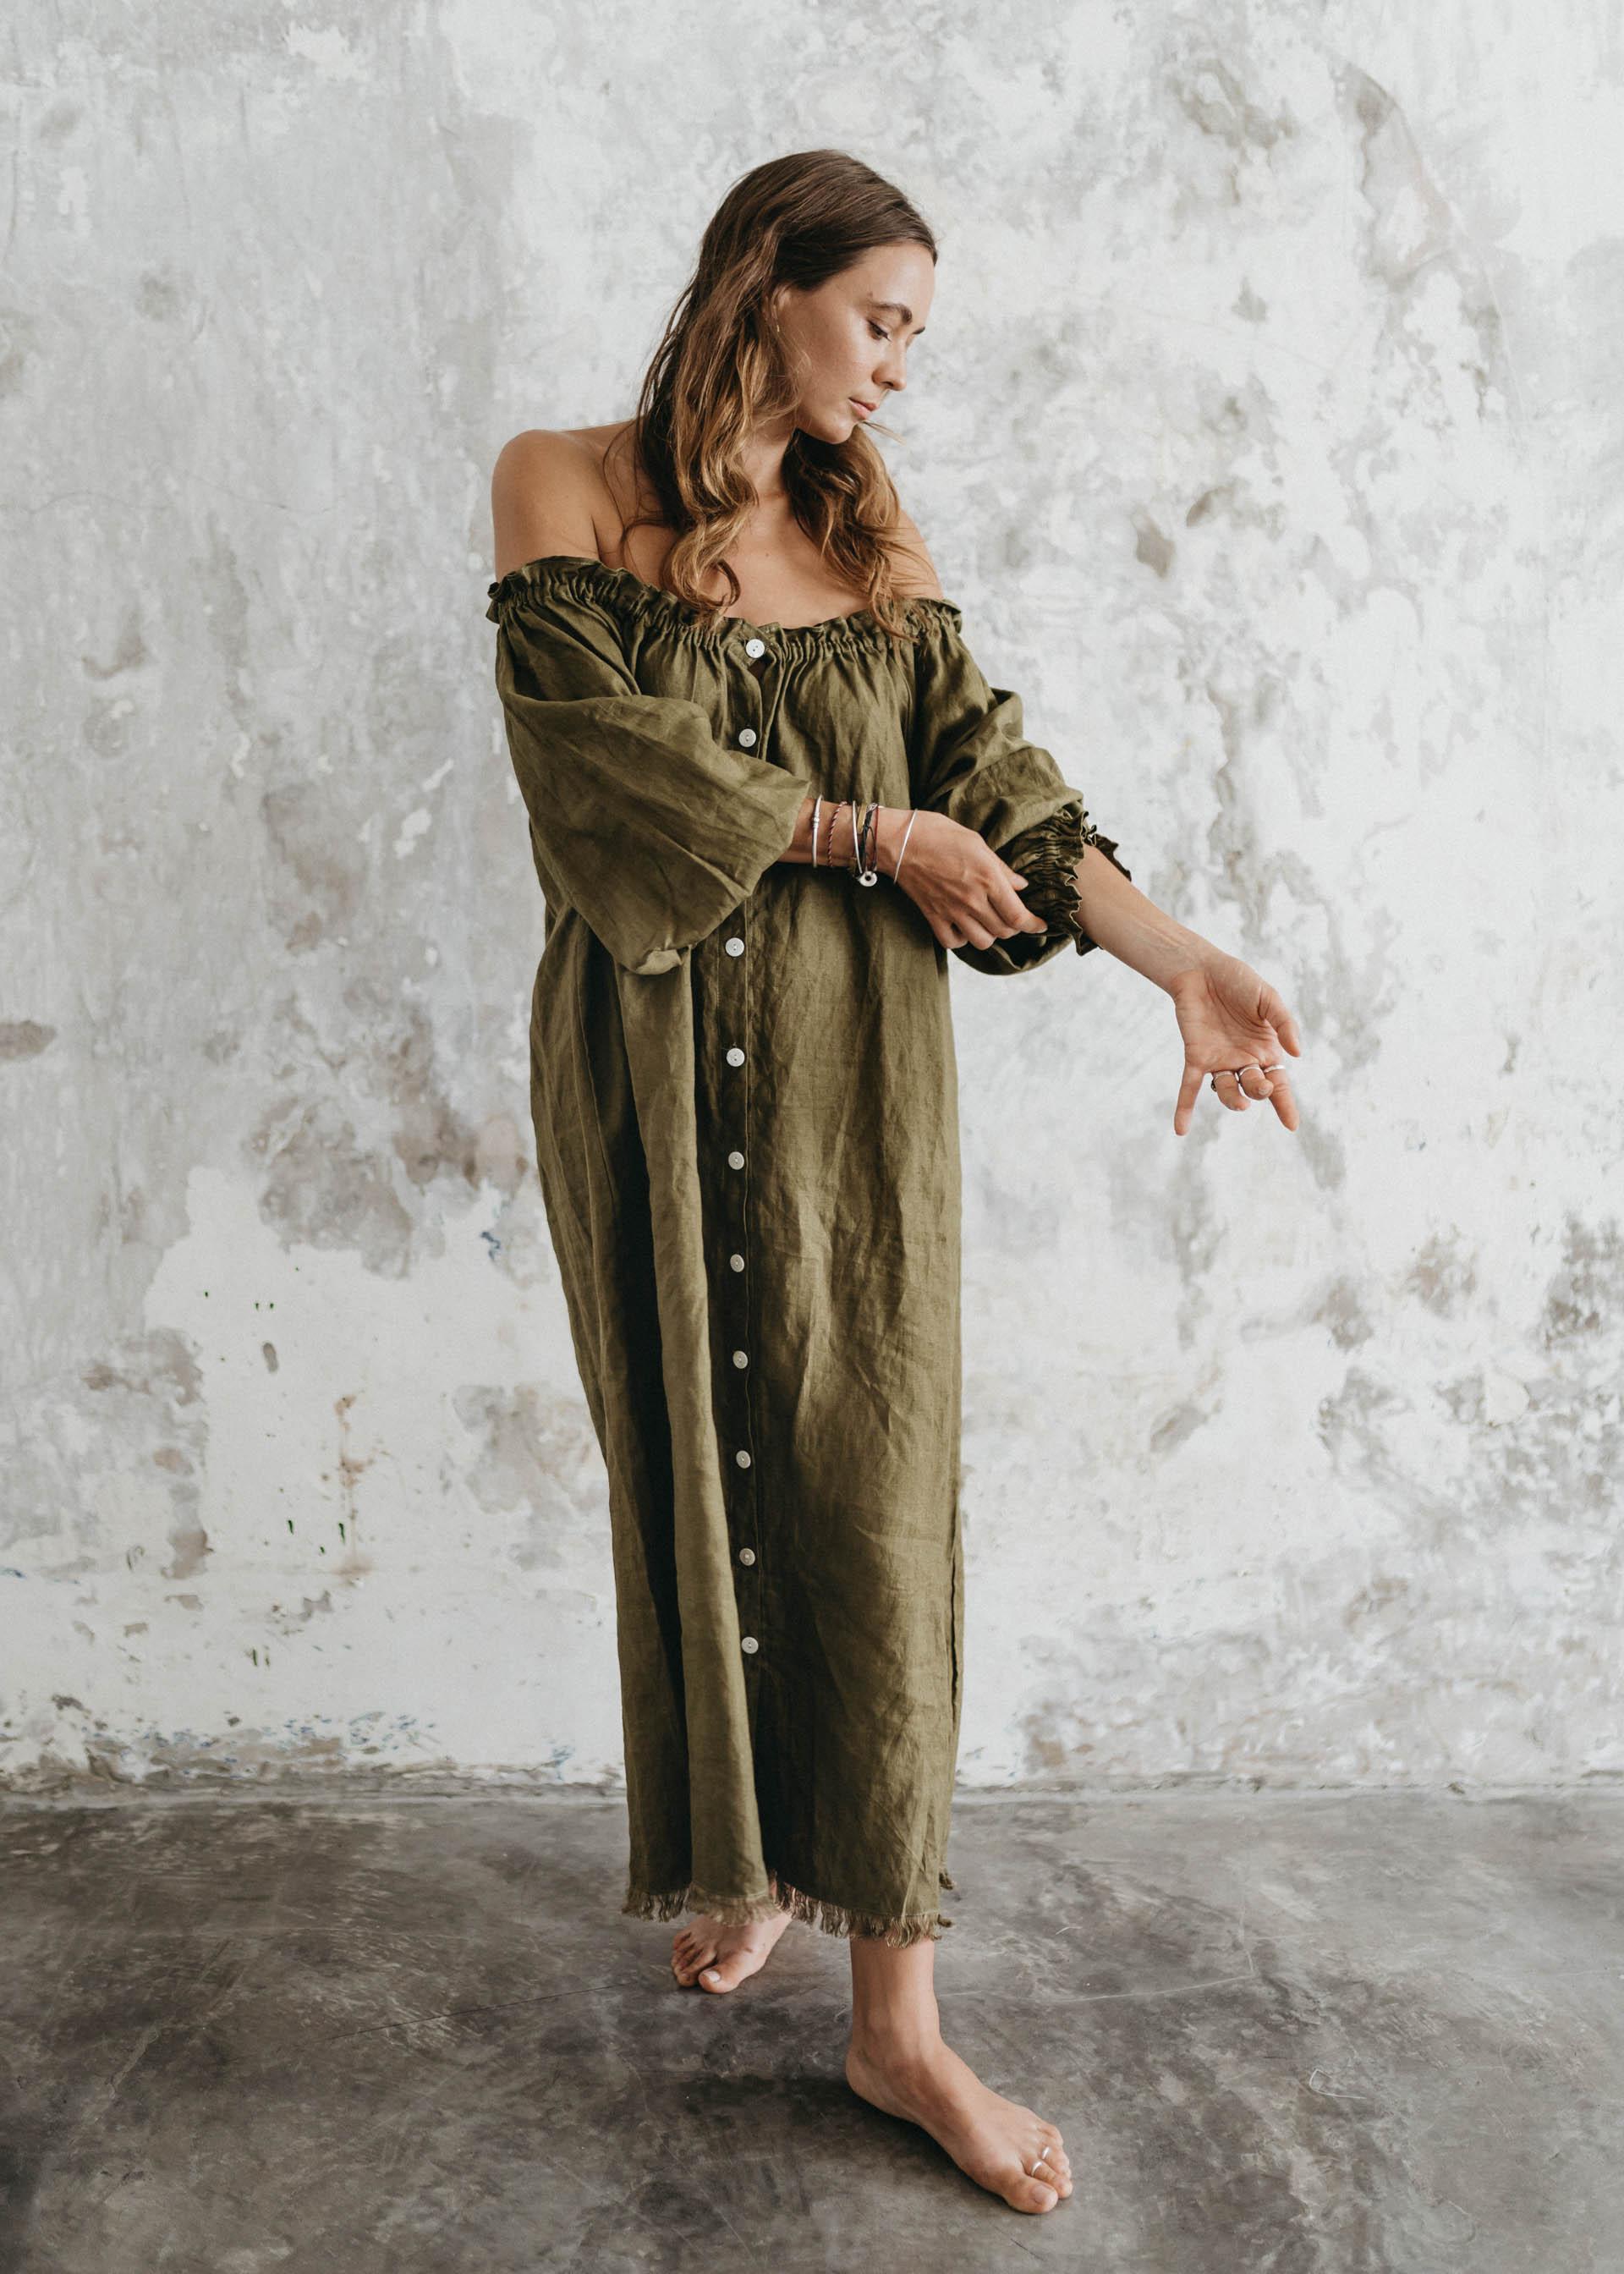 keira-mason-studio-karma-green-dress-puffy-sleeves.jpg